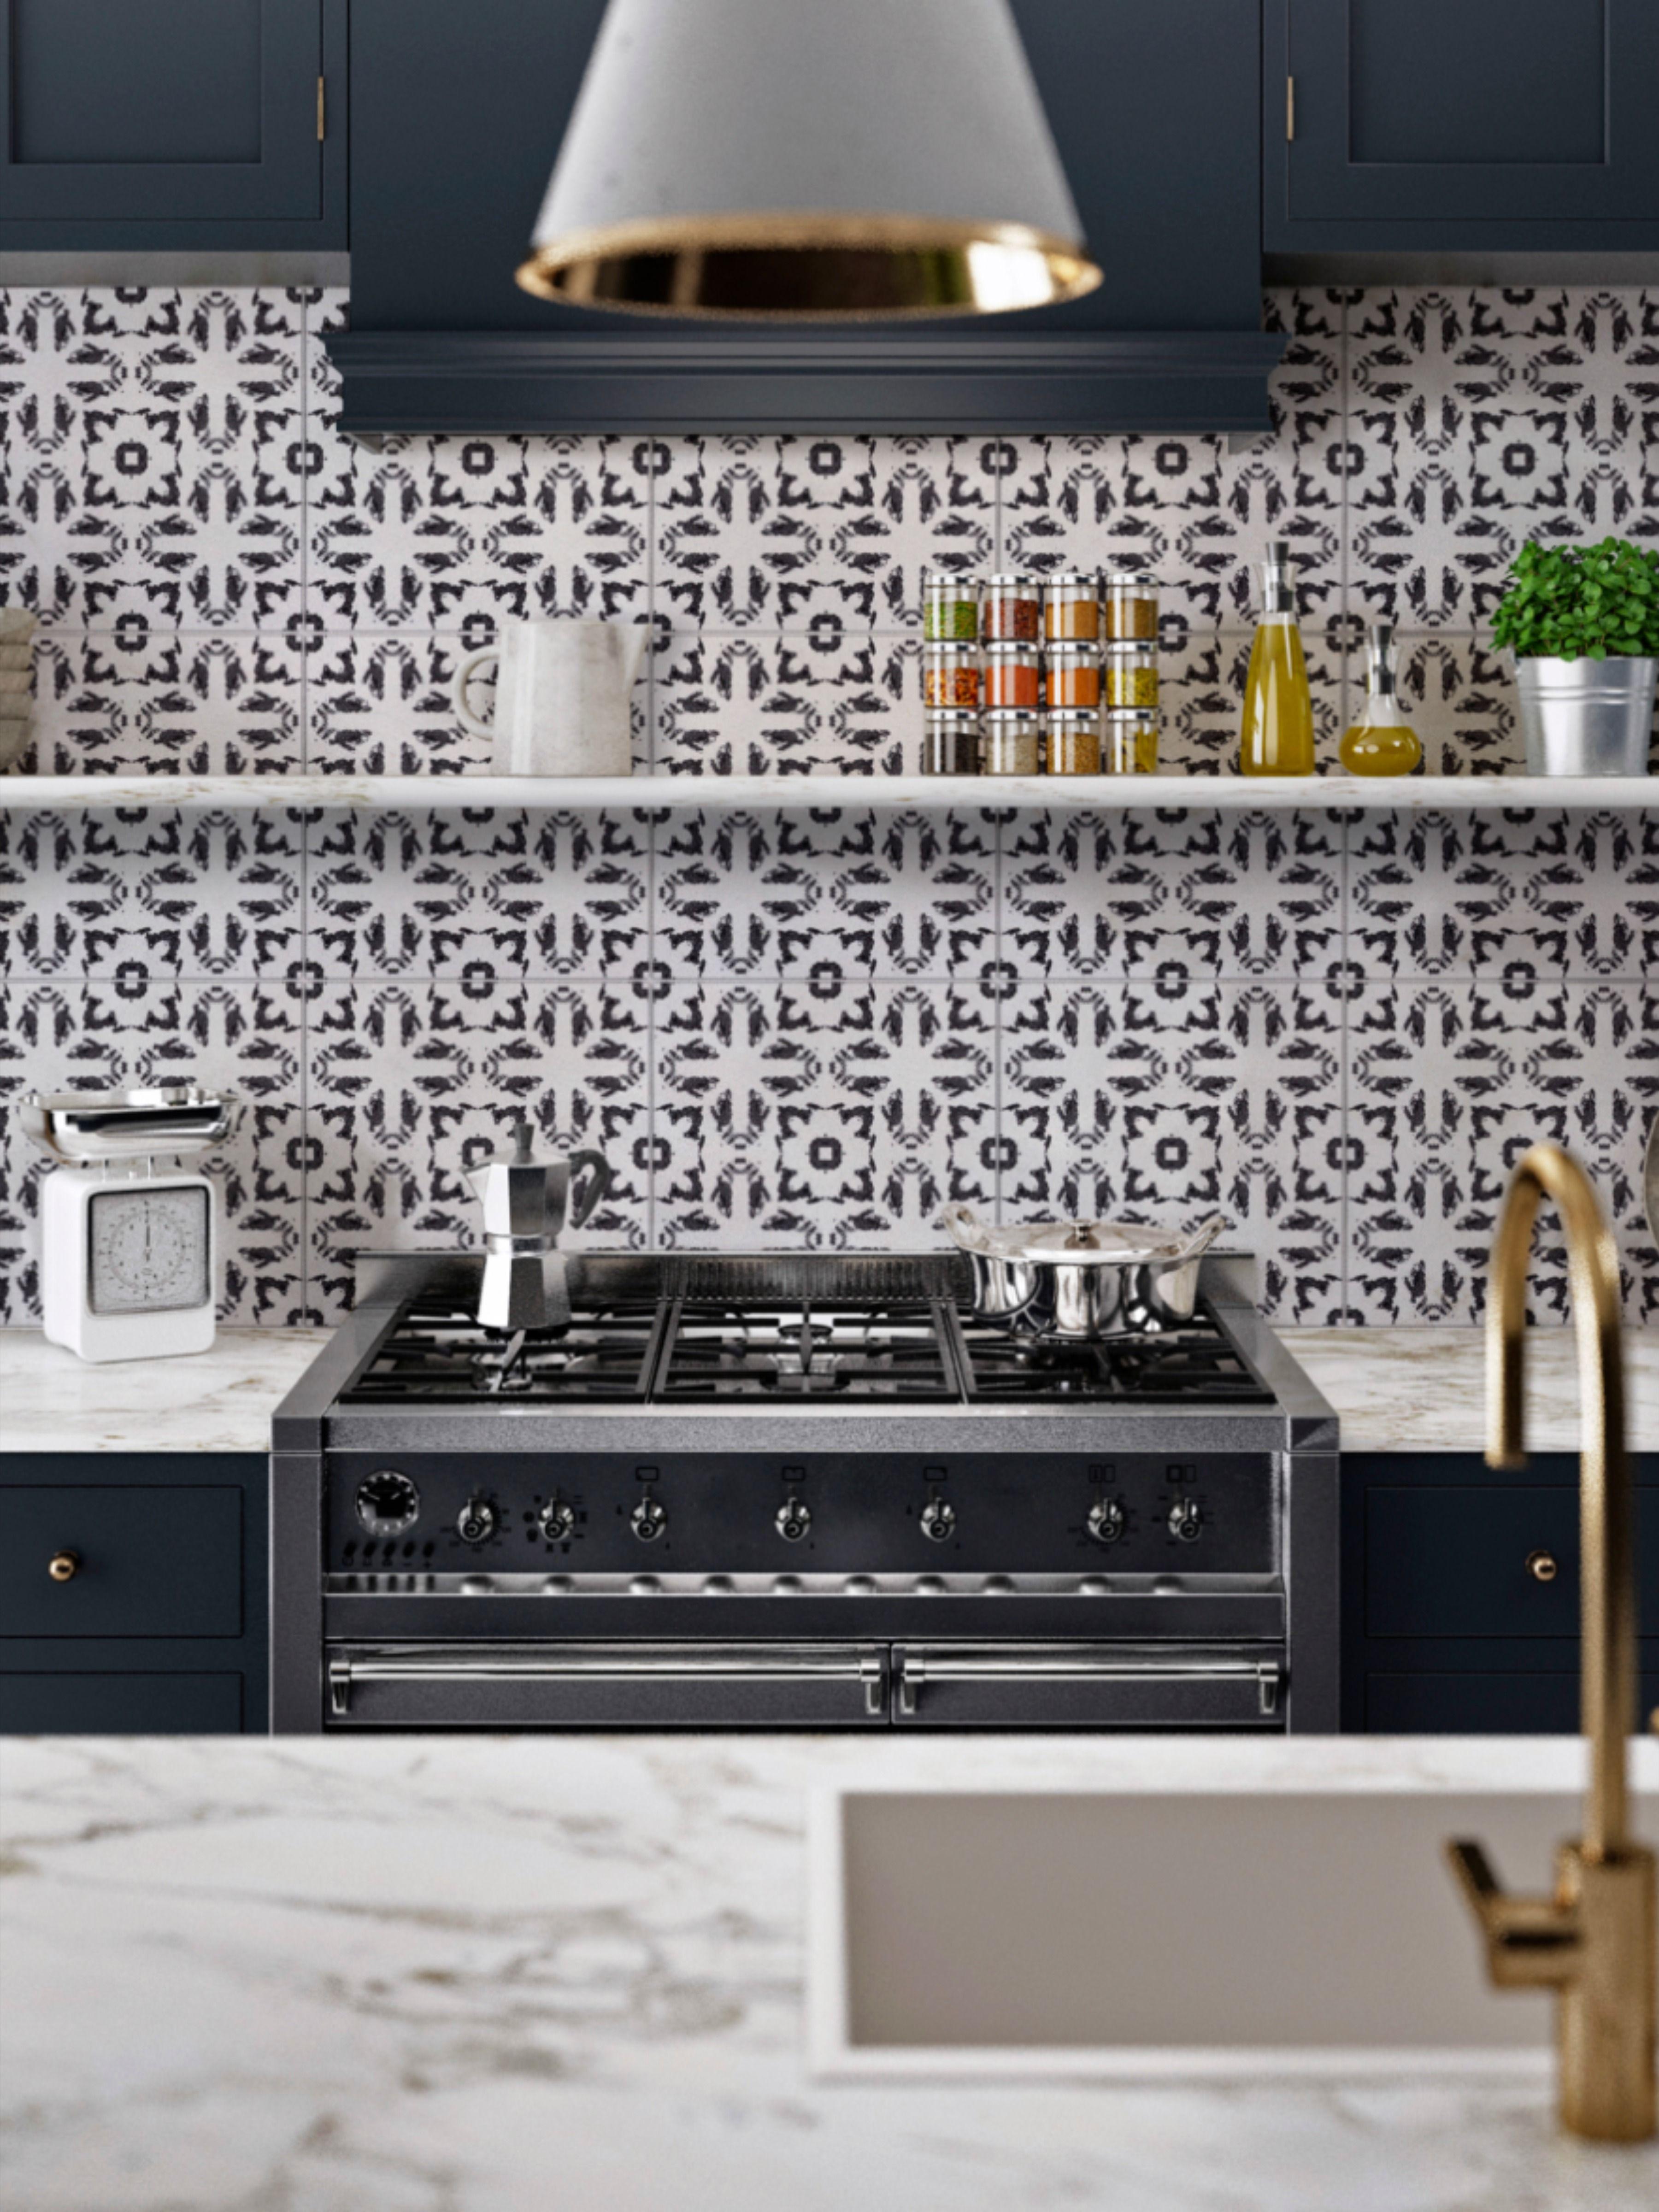 bella floral kitchen backsplash contemporary tile designs kitchen backsplash designs tile design